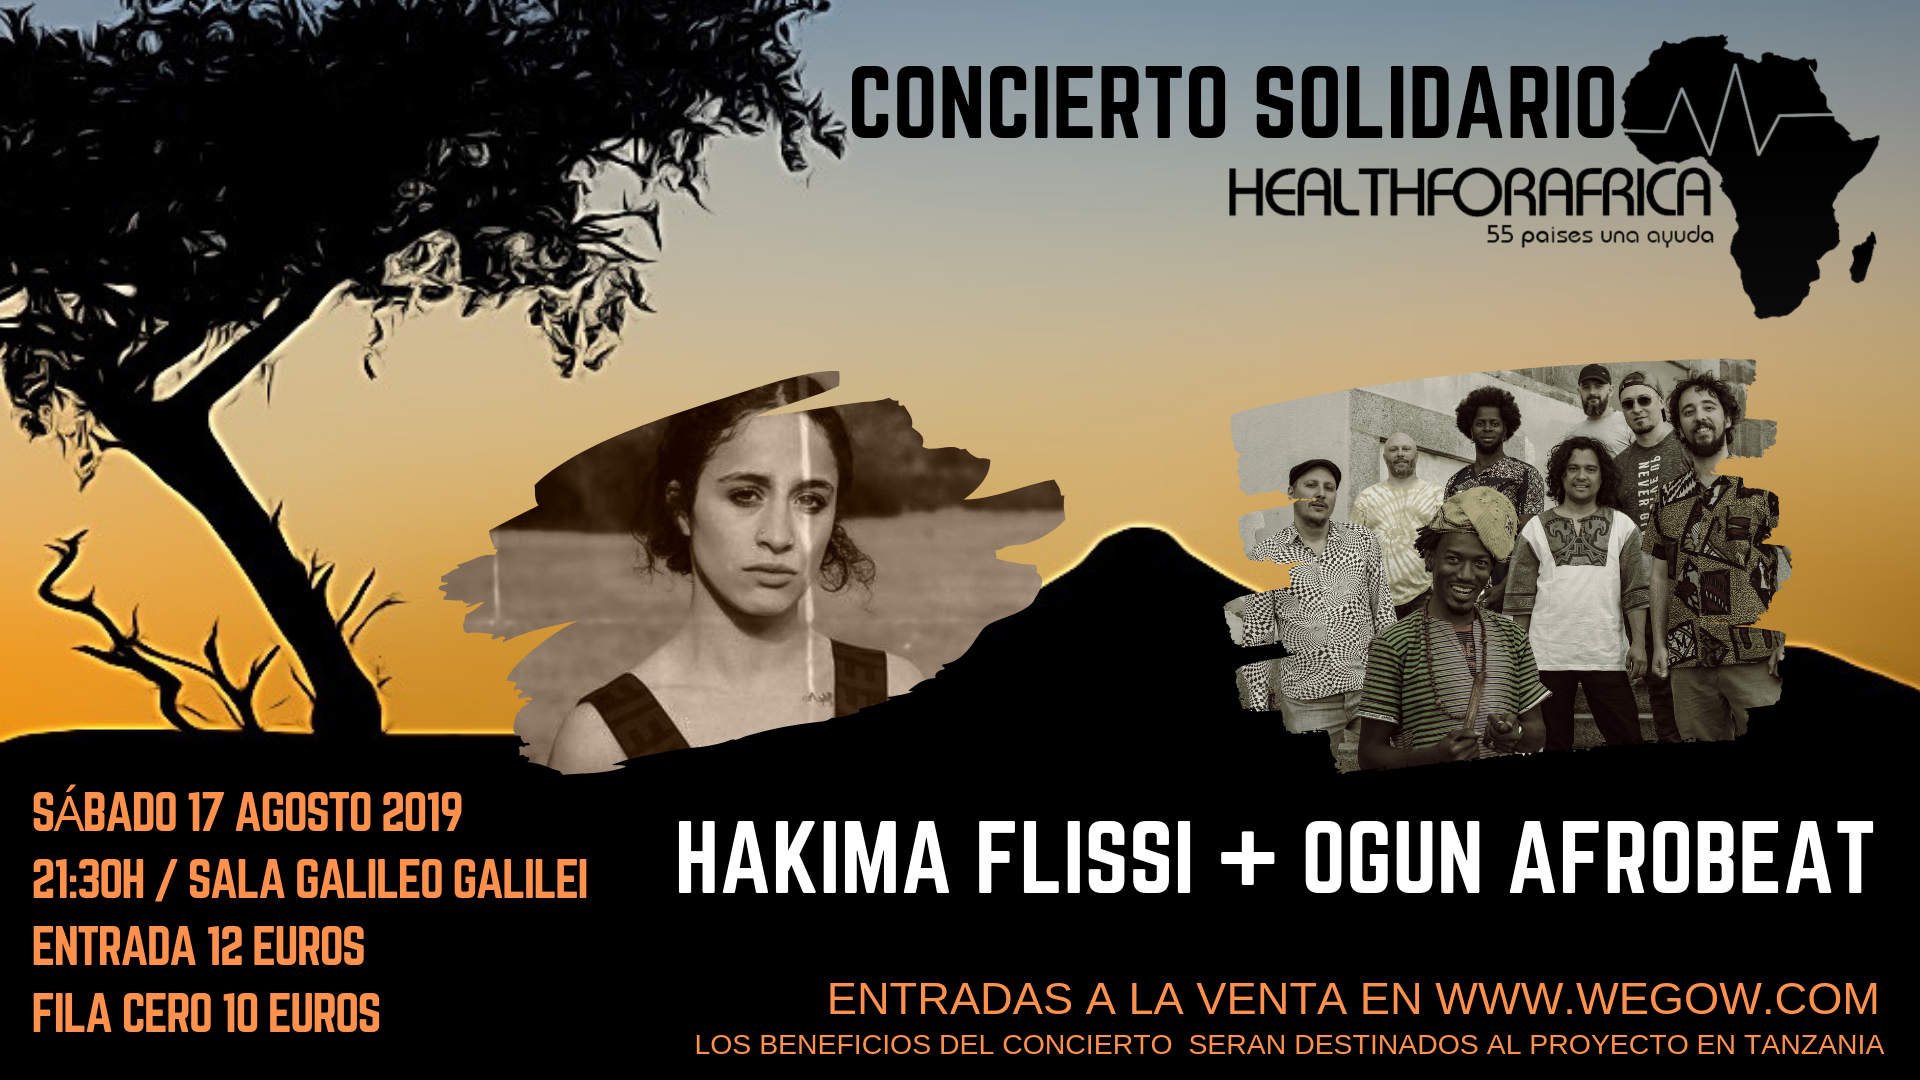 Ogun Afrobeat, Hakima Flissi concert tickets for Sala